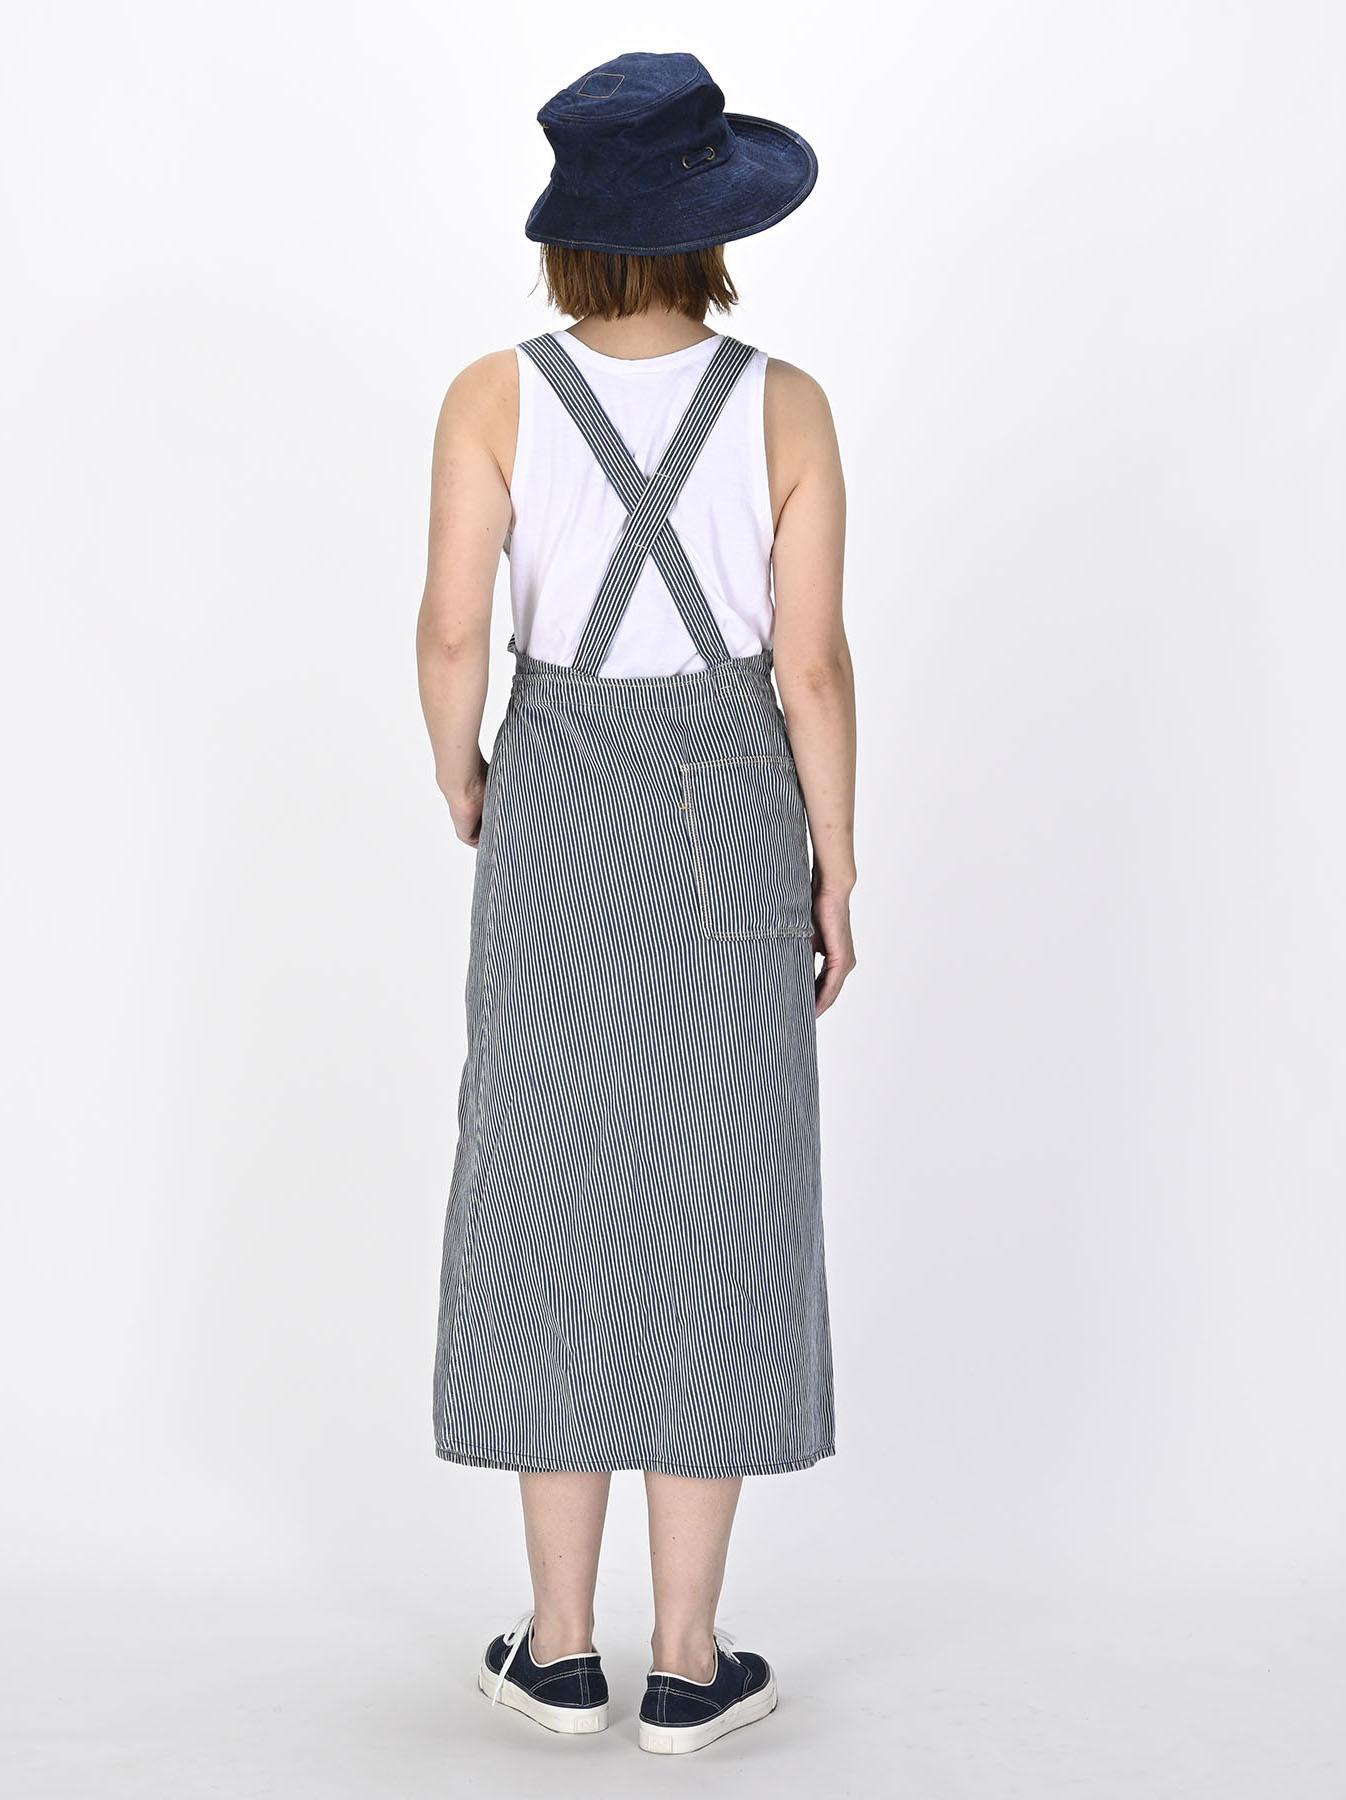 Komugi Denim Aprion Dress-4